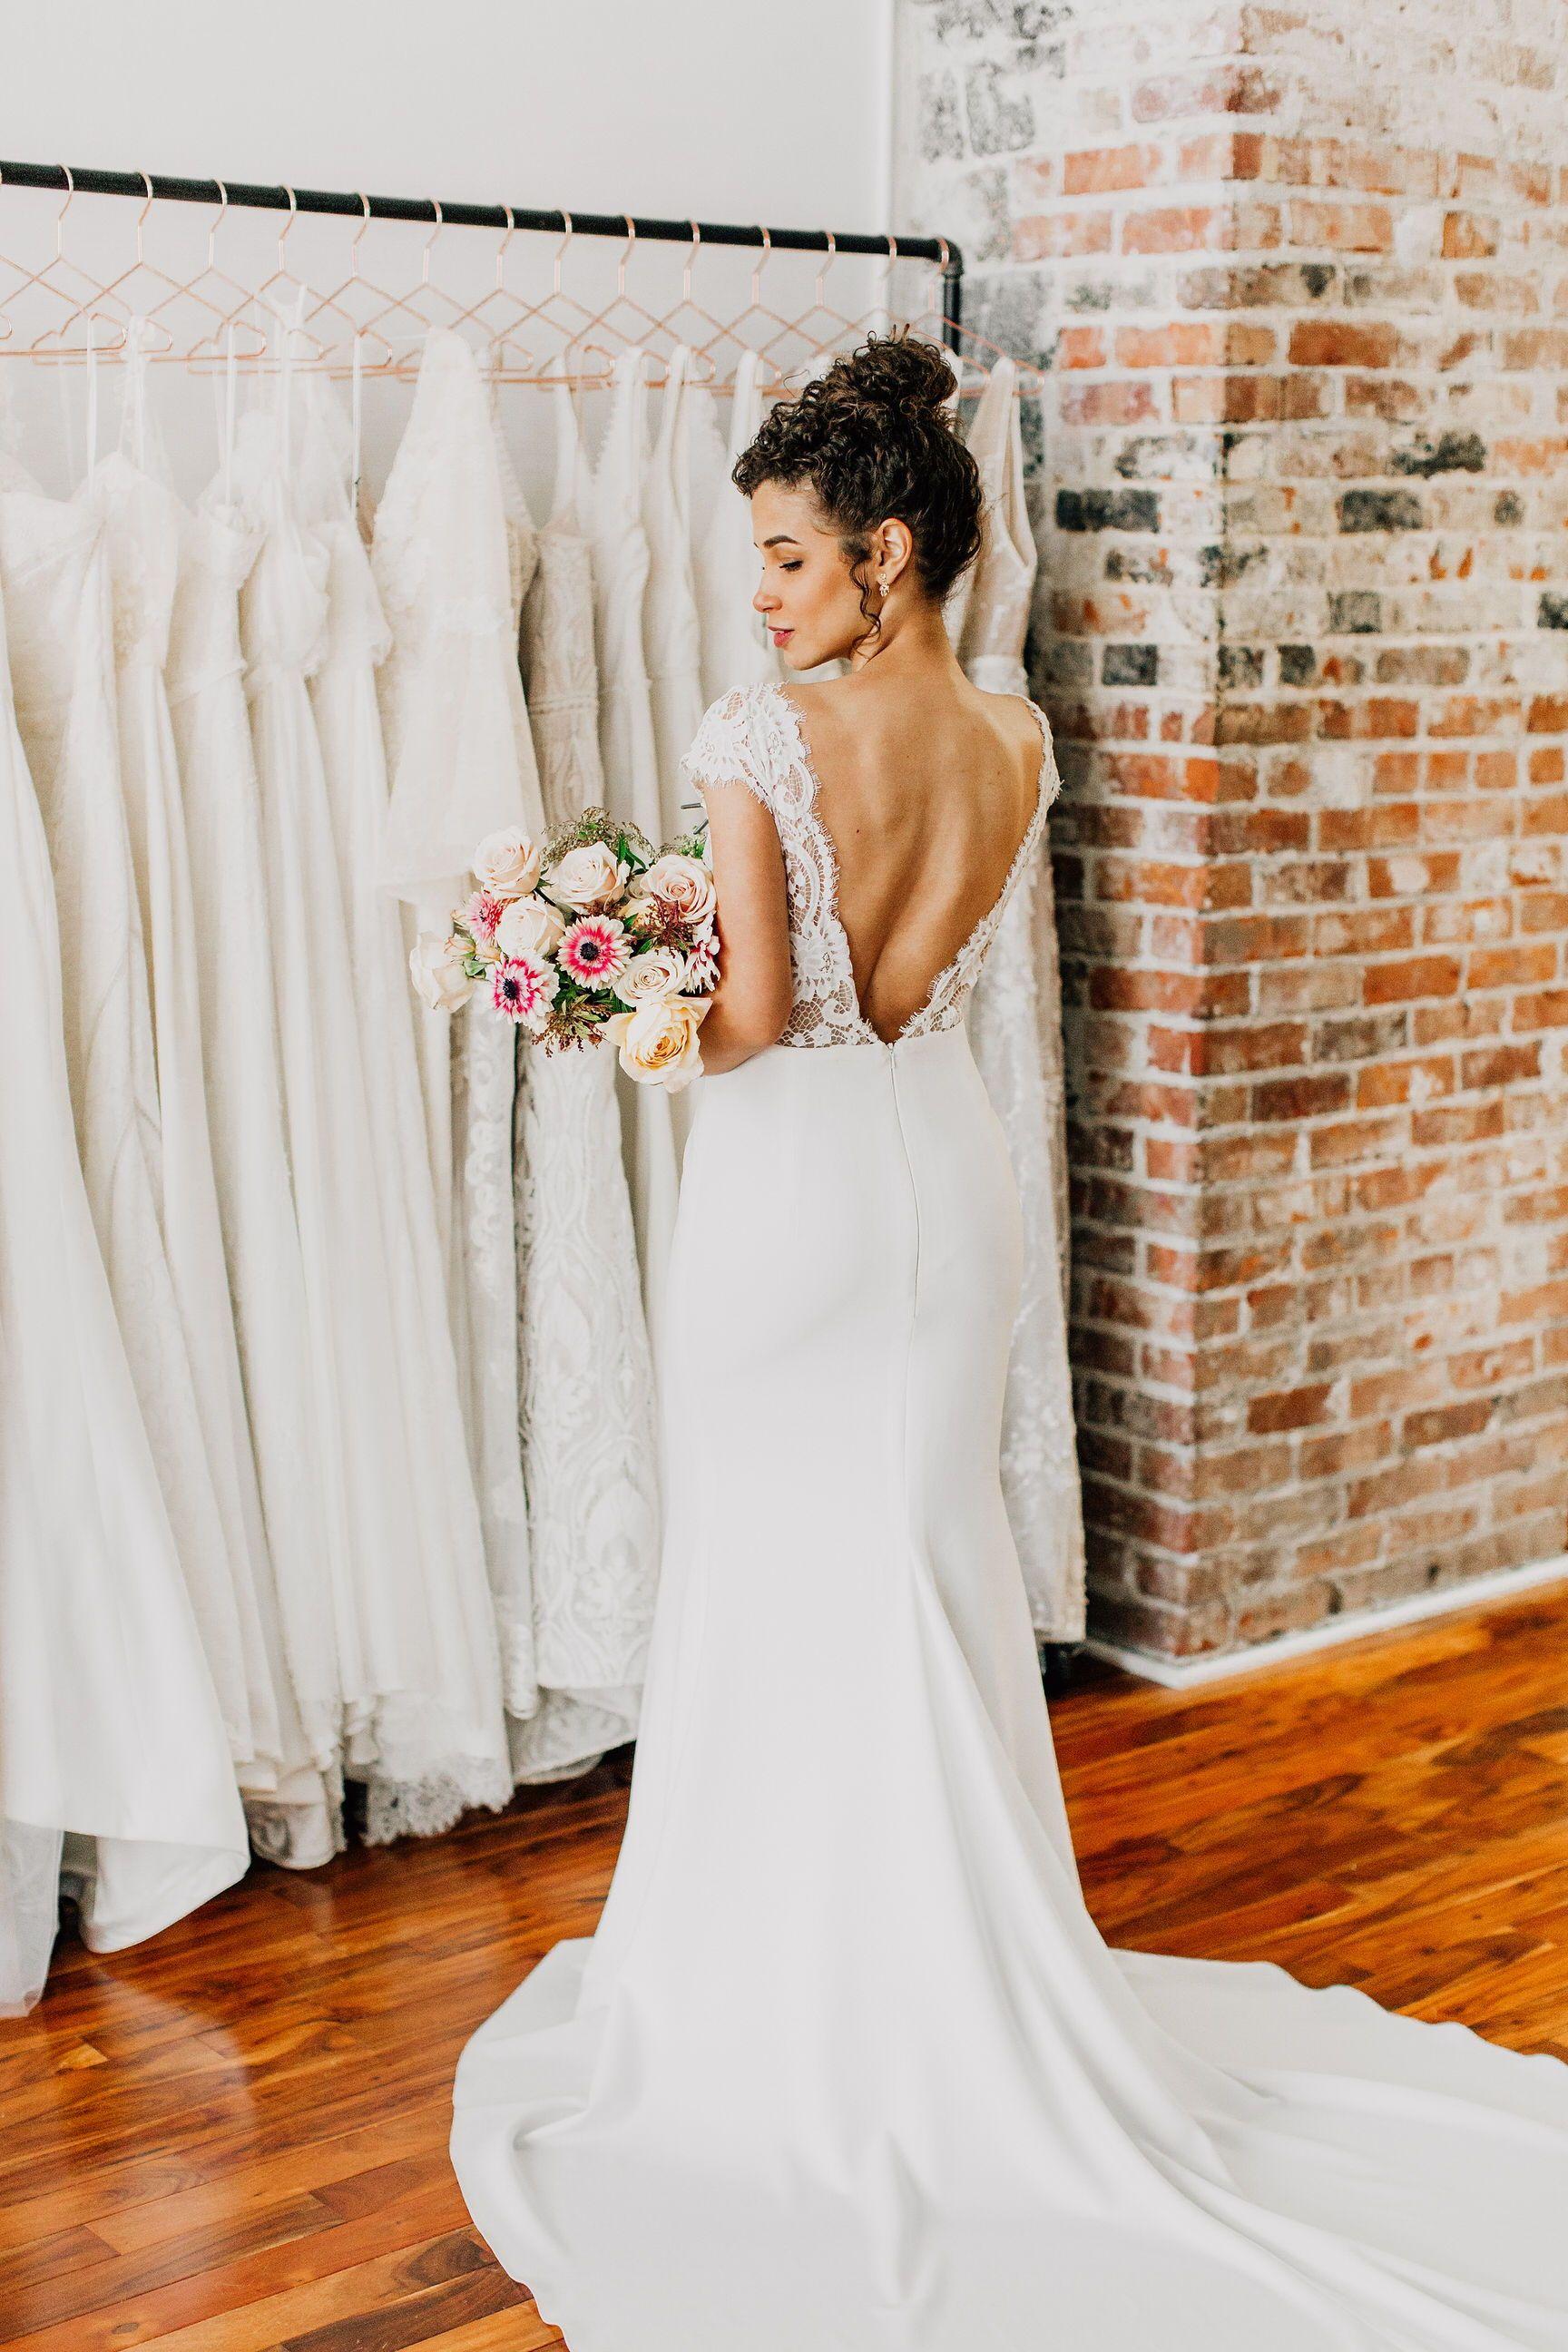 Annalise By Anais Anette 2019 Wedding Dresses Modern Wedding Dresses Fitted Lace Wedding Dress Crepe Wedding Dress Wedding Dresses Wedding Dress Low Back,Beach Wedding Wedding Dresses Simple